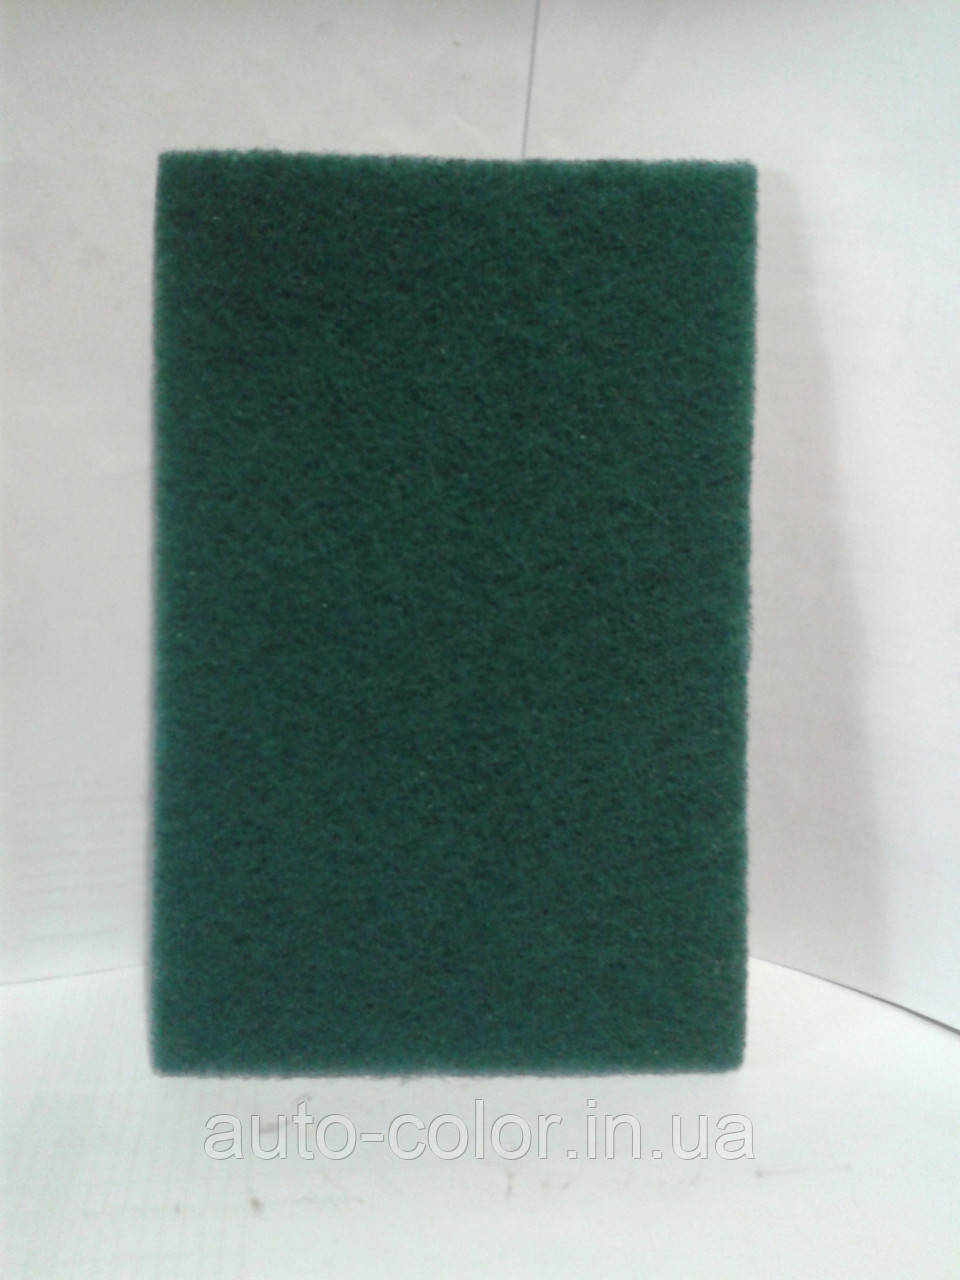 Абразивне волокно зелене в аркушах (скотч-брайт)